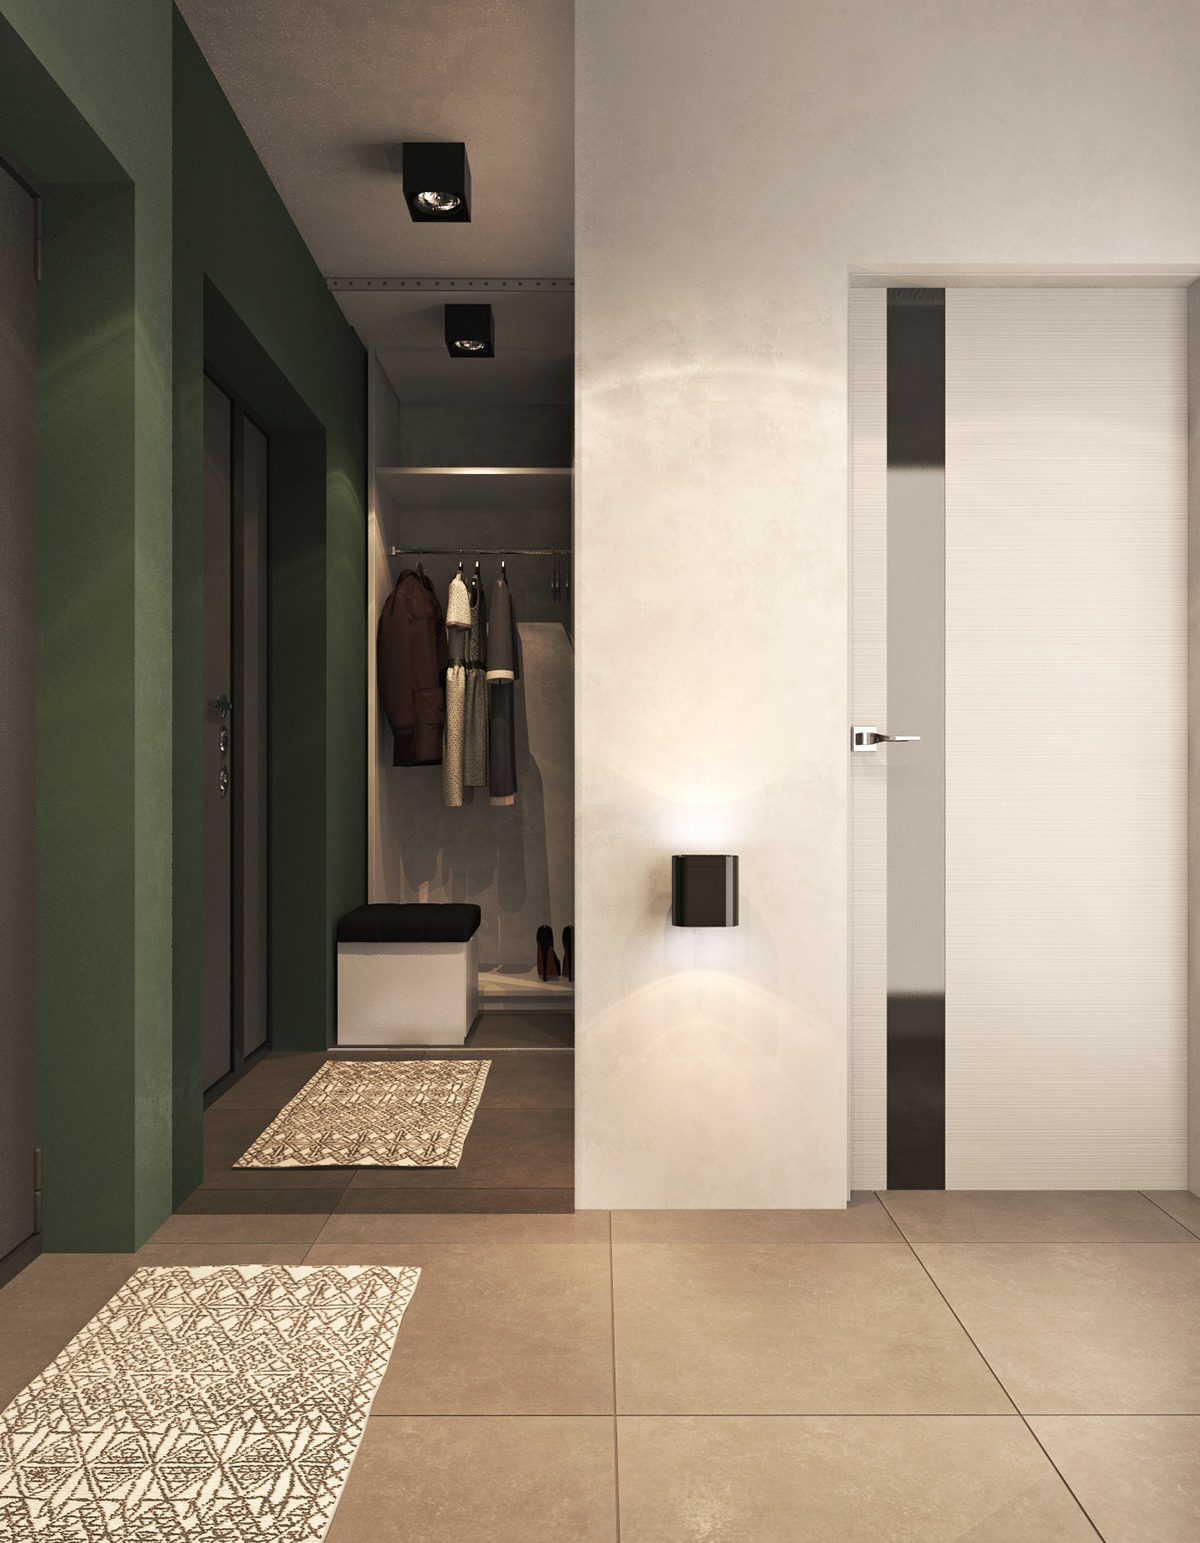 Green entryway theme